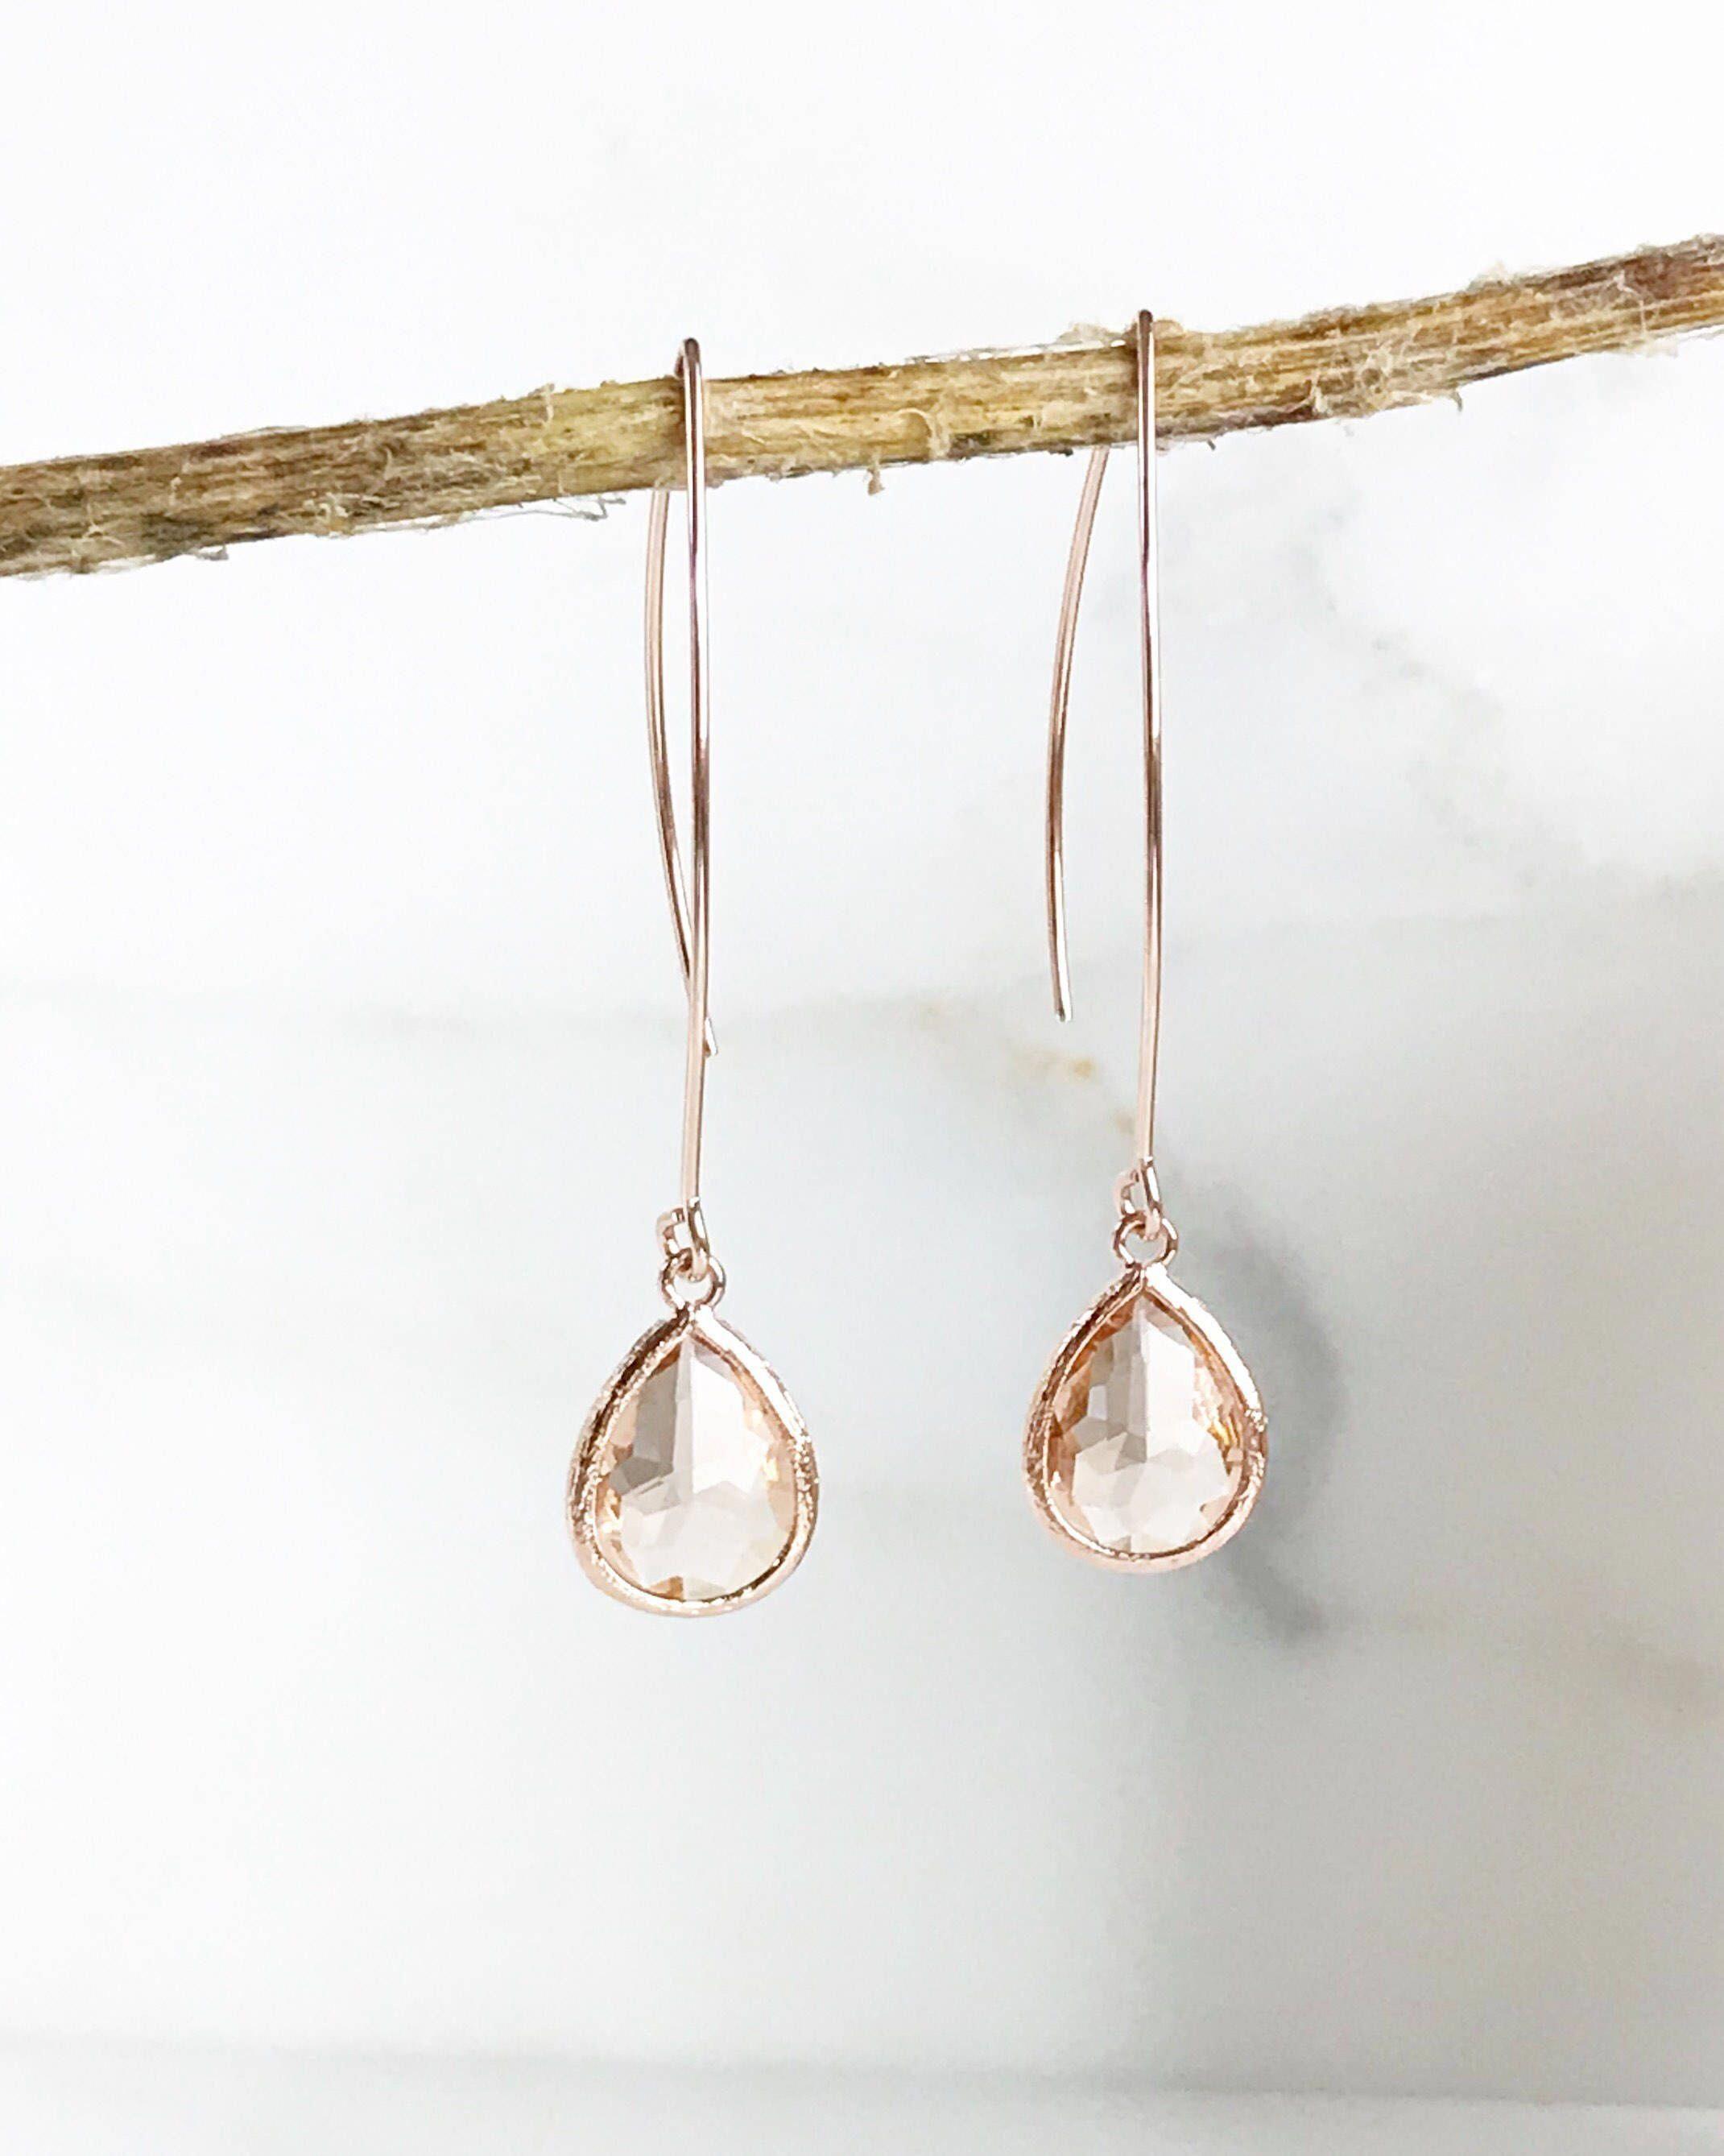 Rose Gold and Champagne Drop Earrings. Bridesmaid Gift. Rose Gold Drop Earrings. Wedding Jewelry. Simple Earrings. Dangle Earrings. Gift